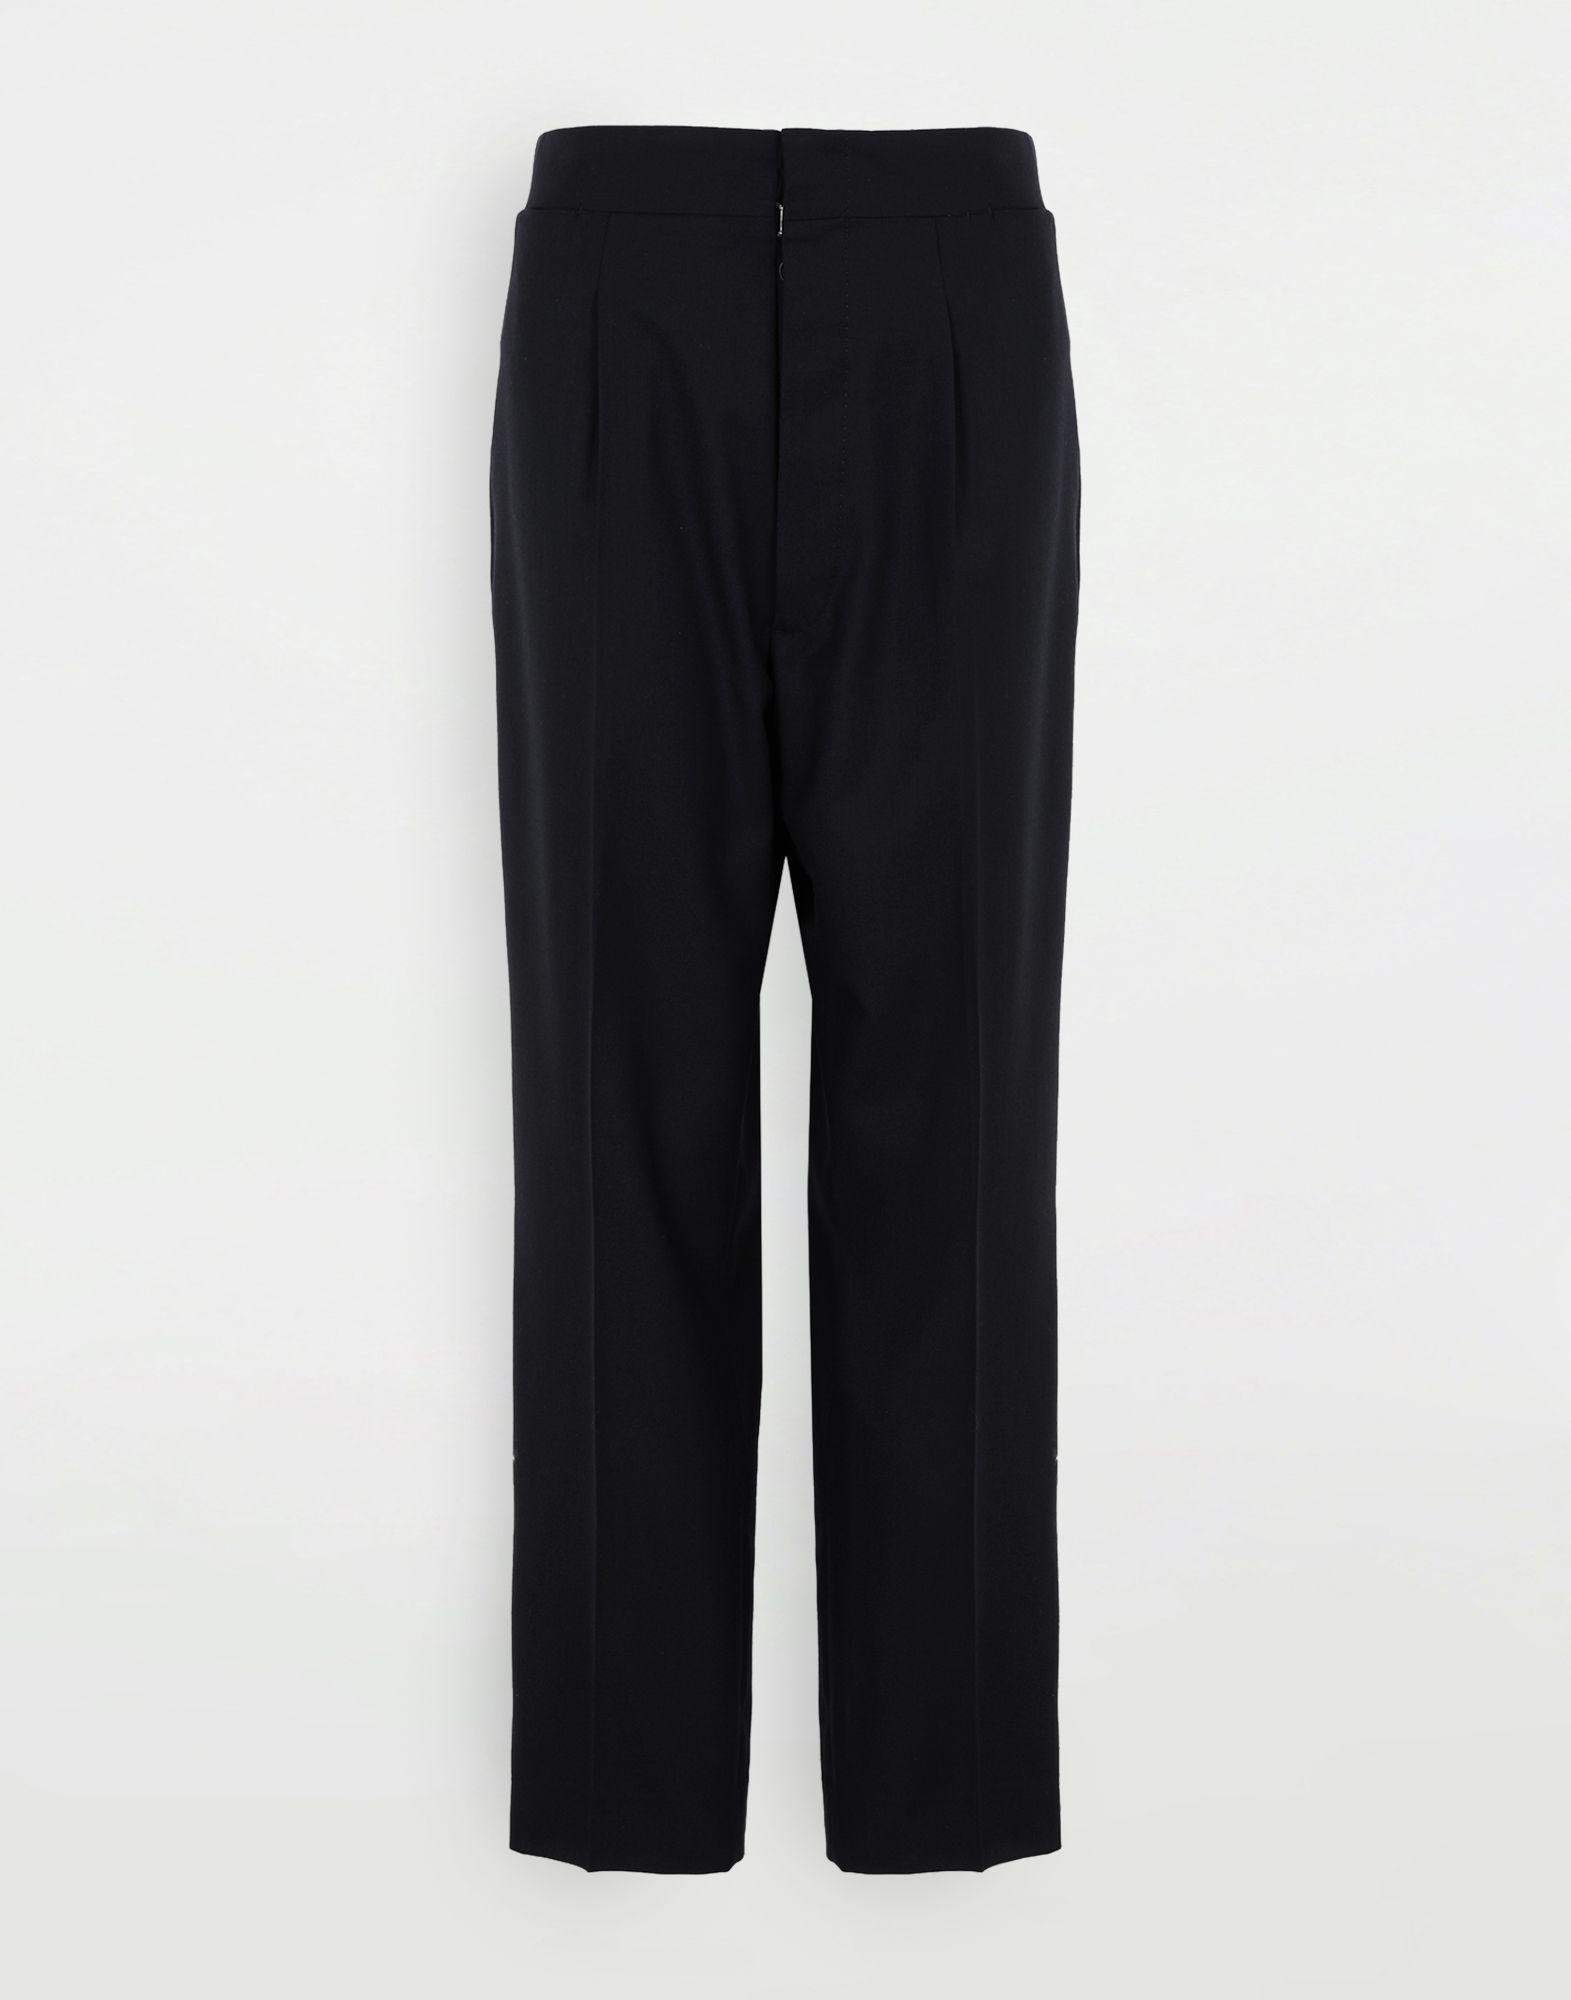 MAISON MARGIELA Tailored pants Casual pants Woman f